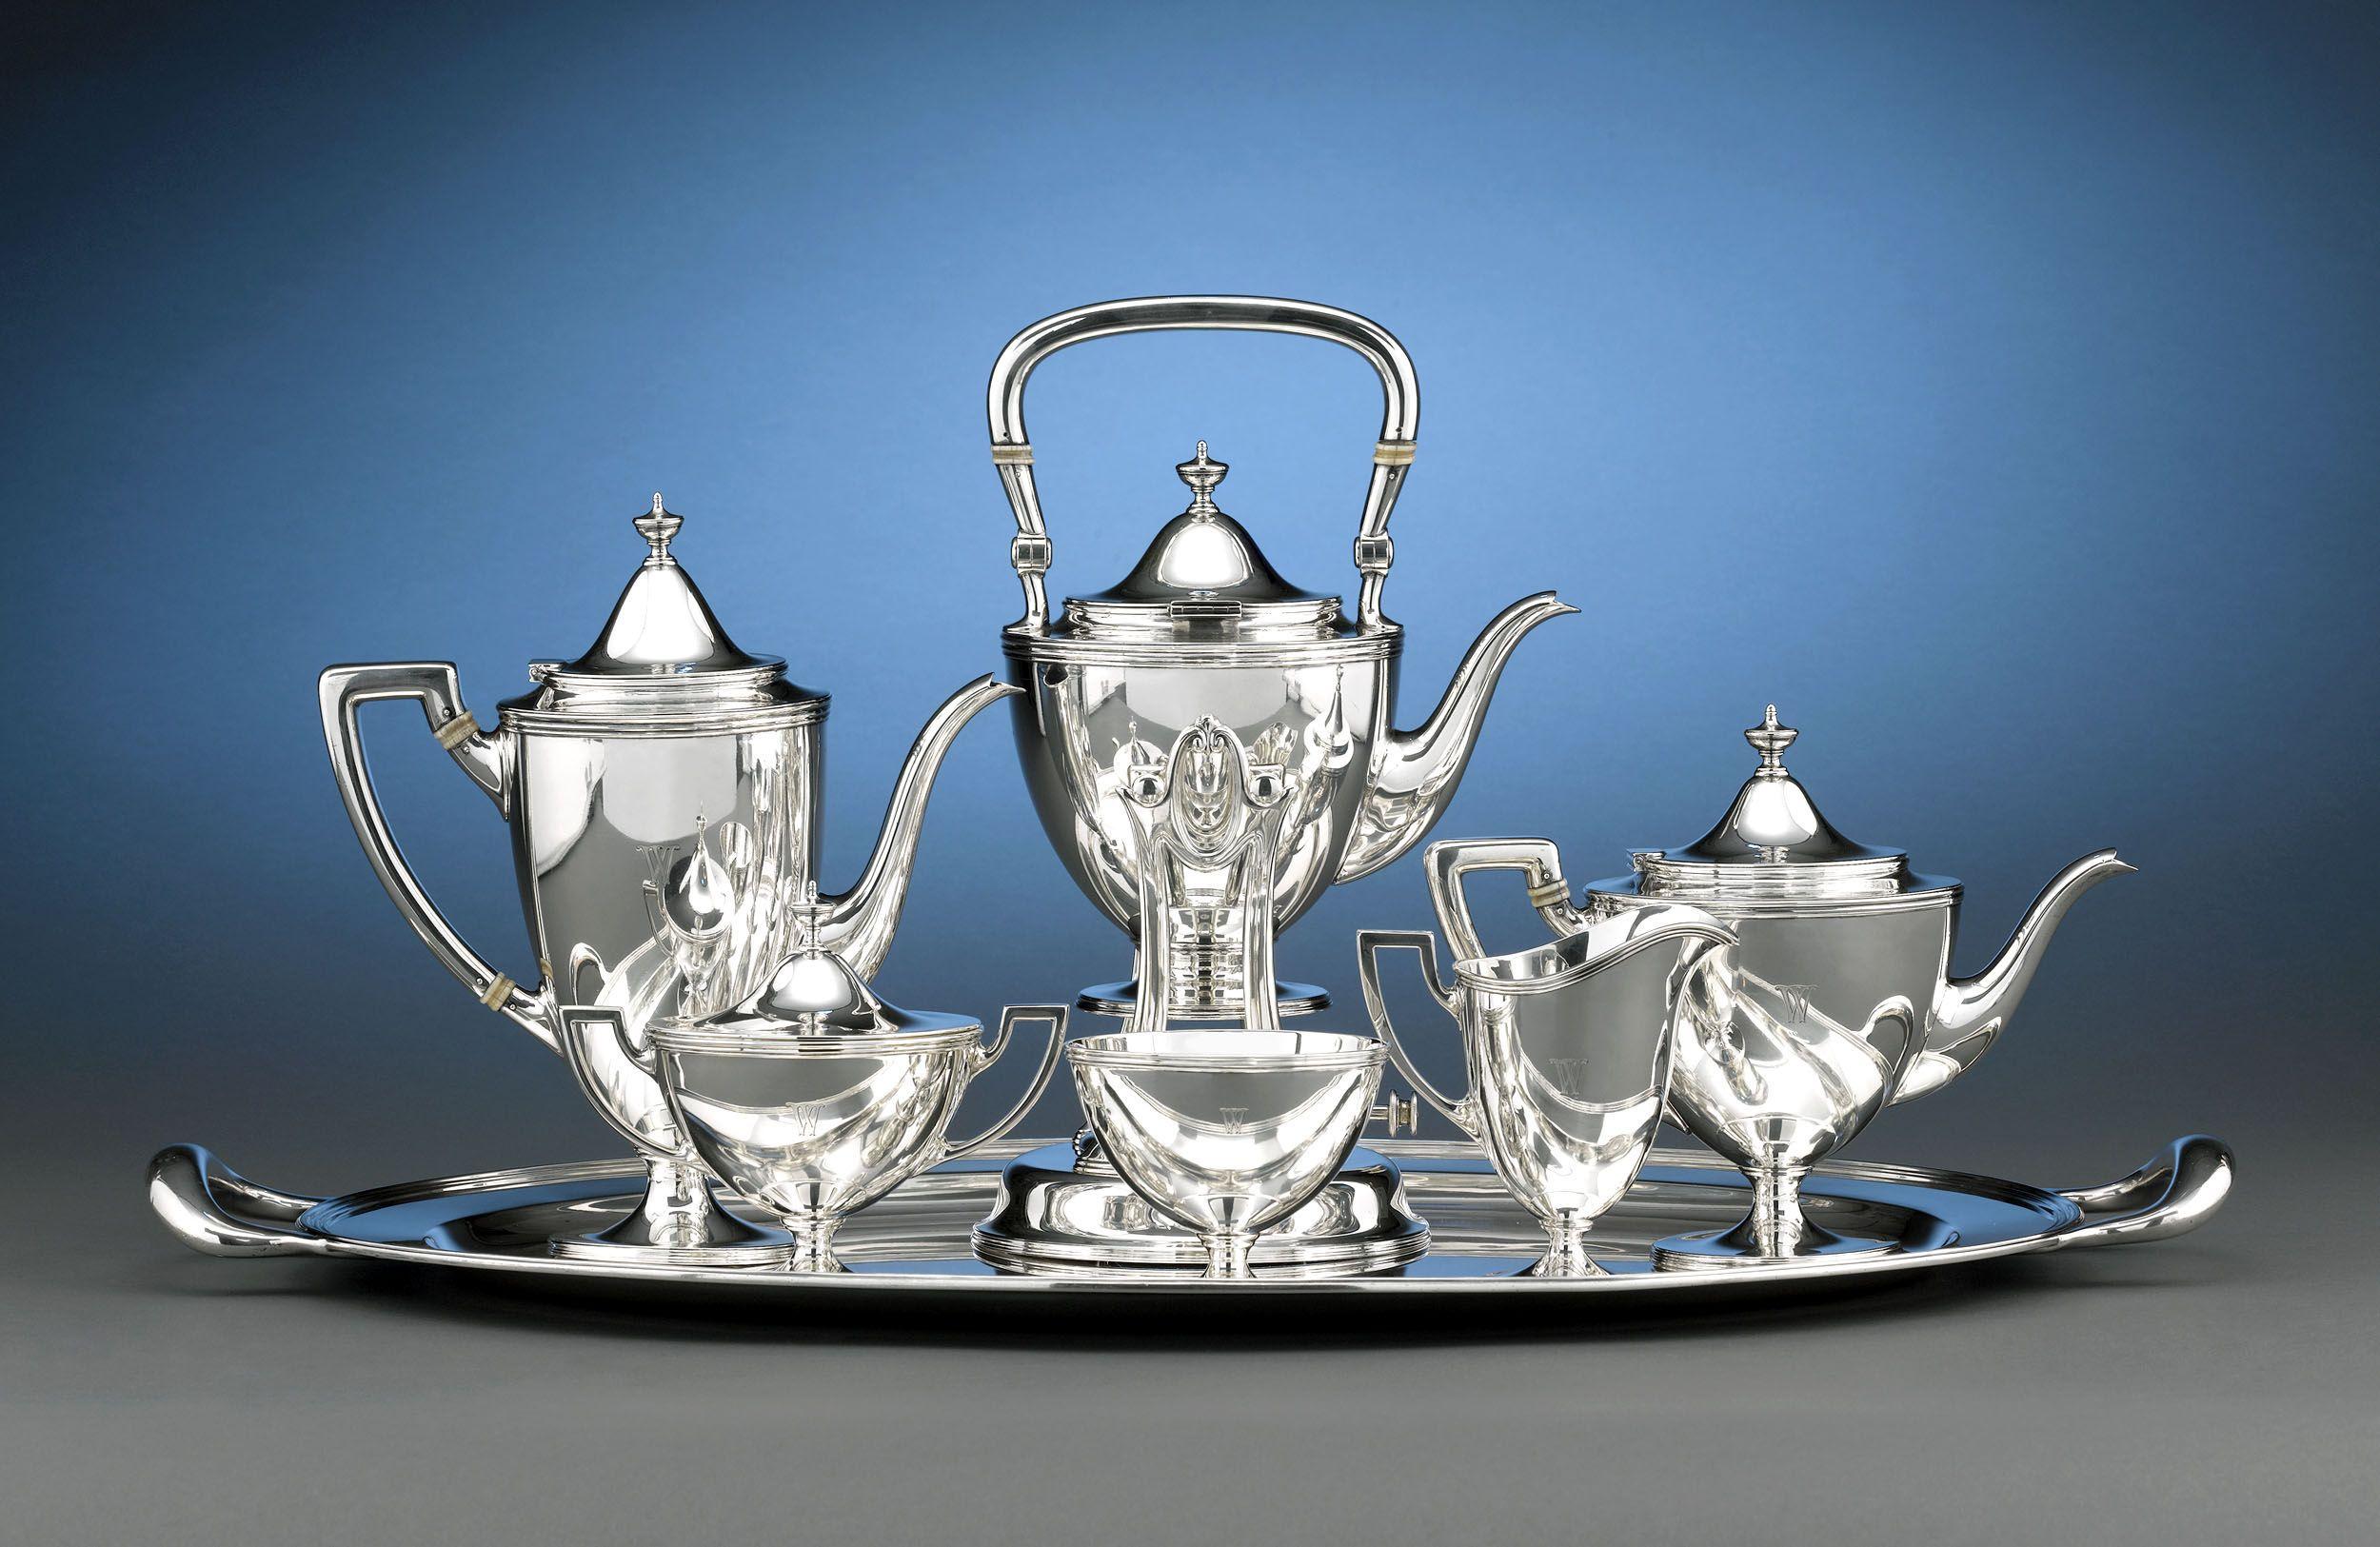 Antique tiffany silver antique silver tea set tiffany